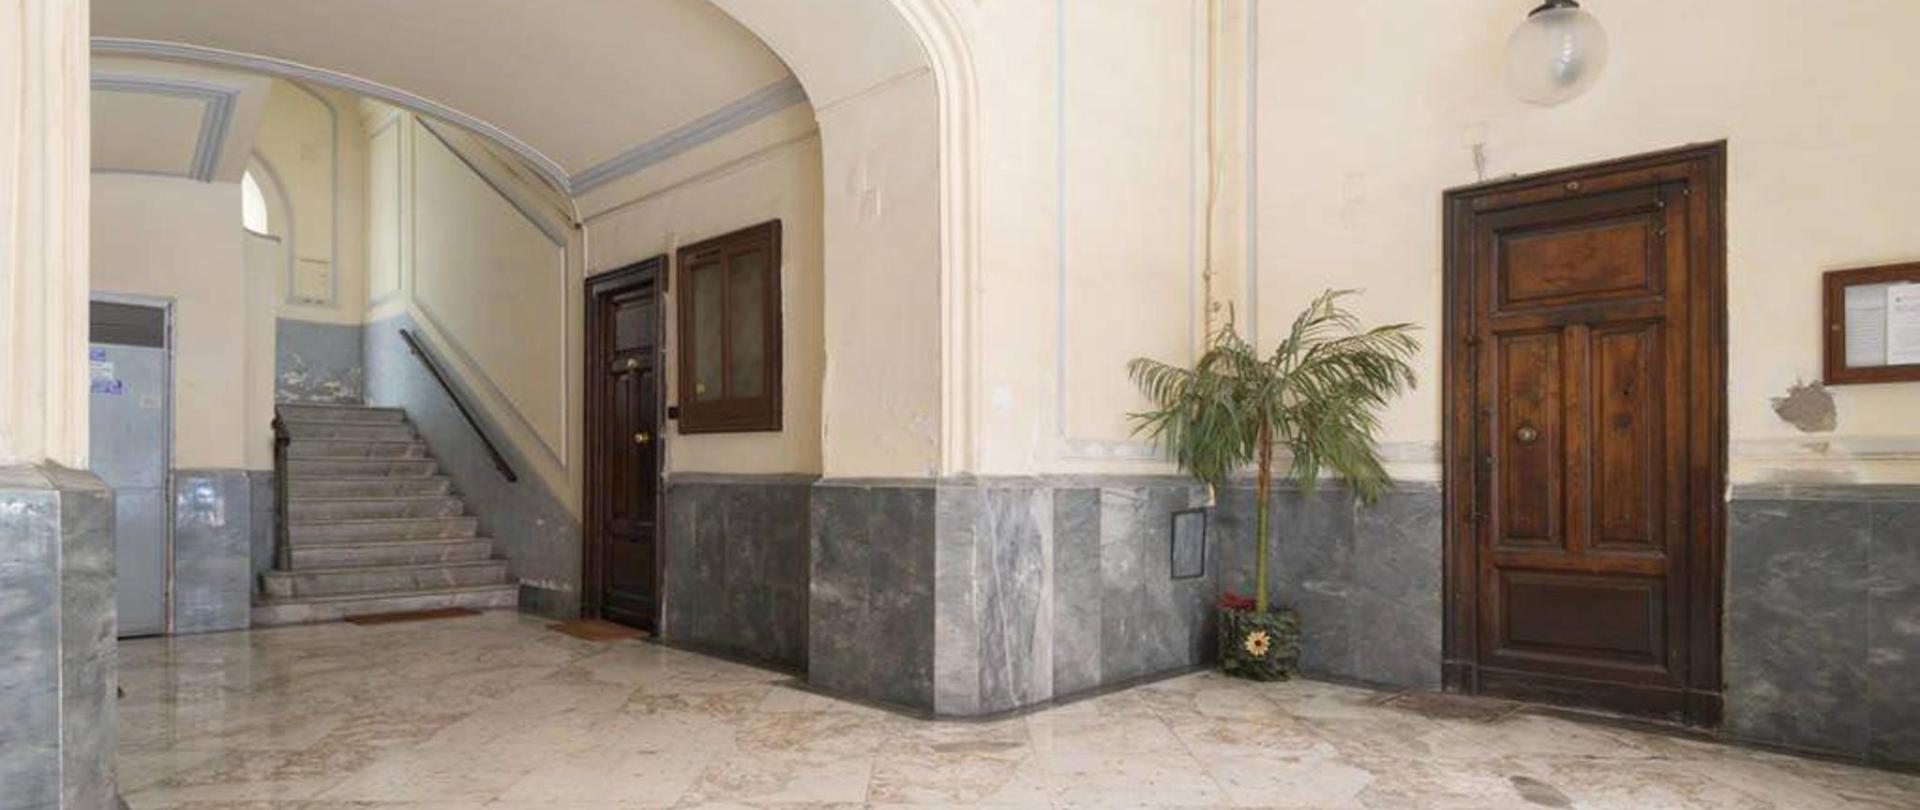 entrata-palazzo.jpg